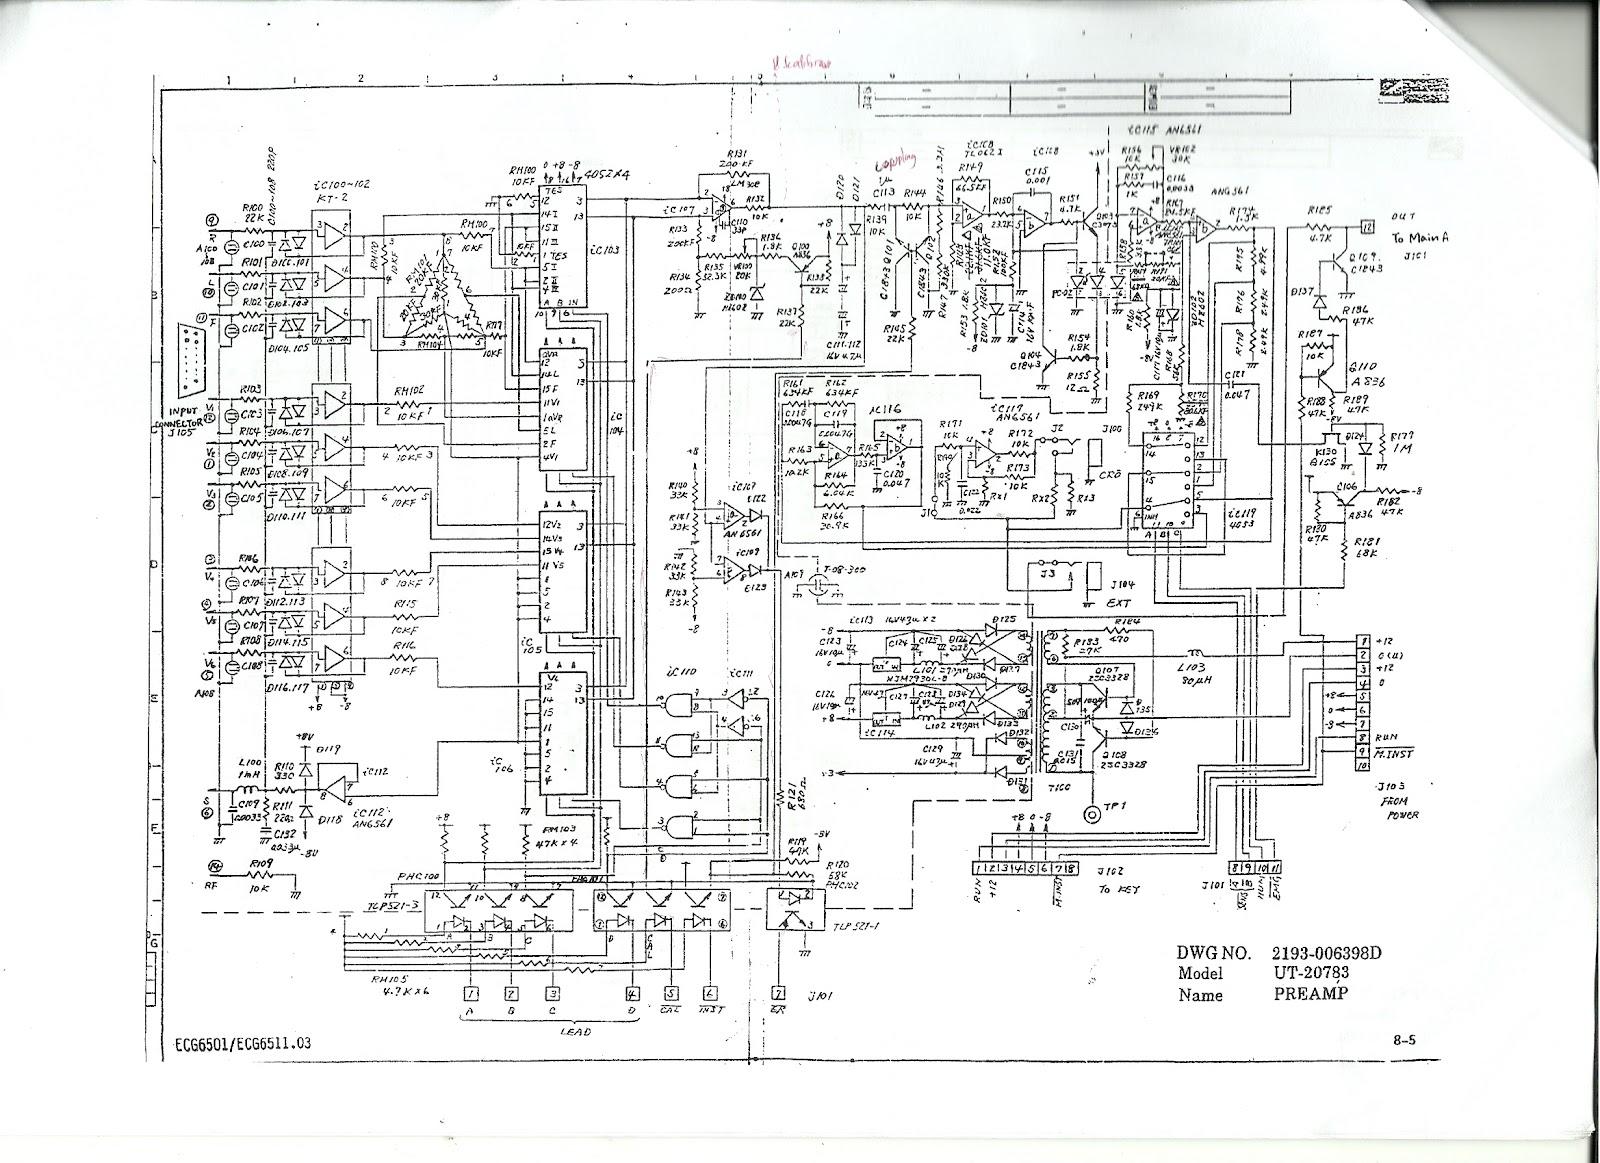 small resolution of ekg wiring diagram guide about wiring diagram wiring diagram engine 99 taurus wiring diagram ecg